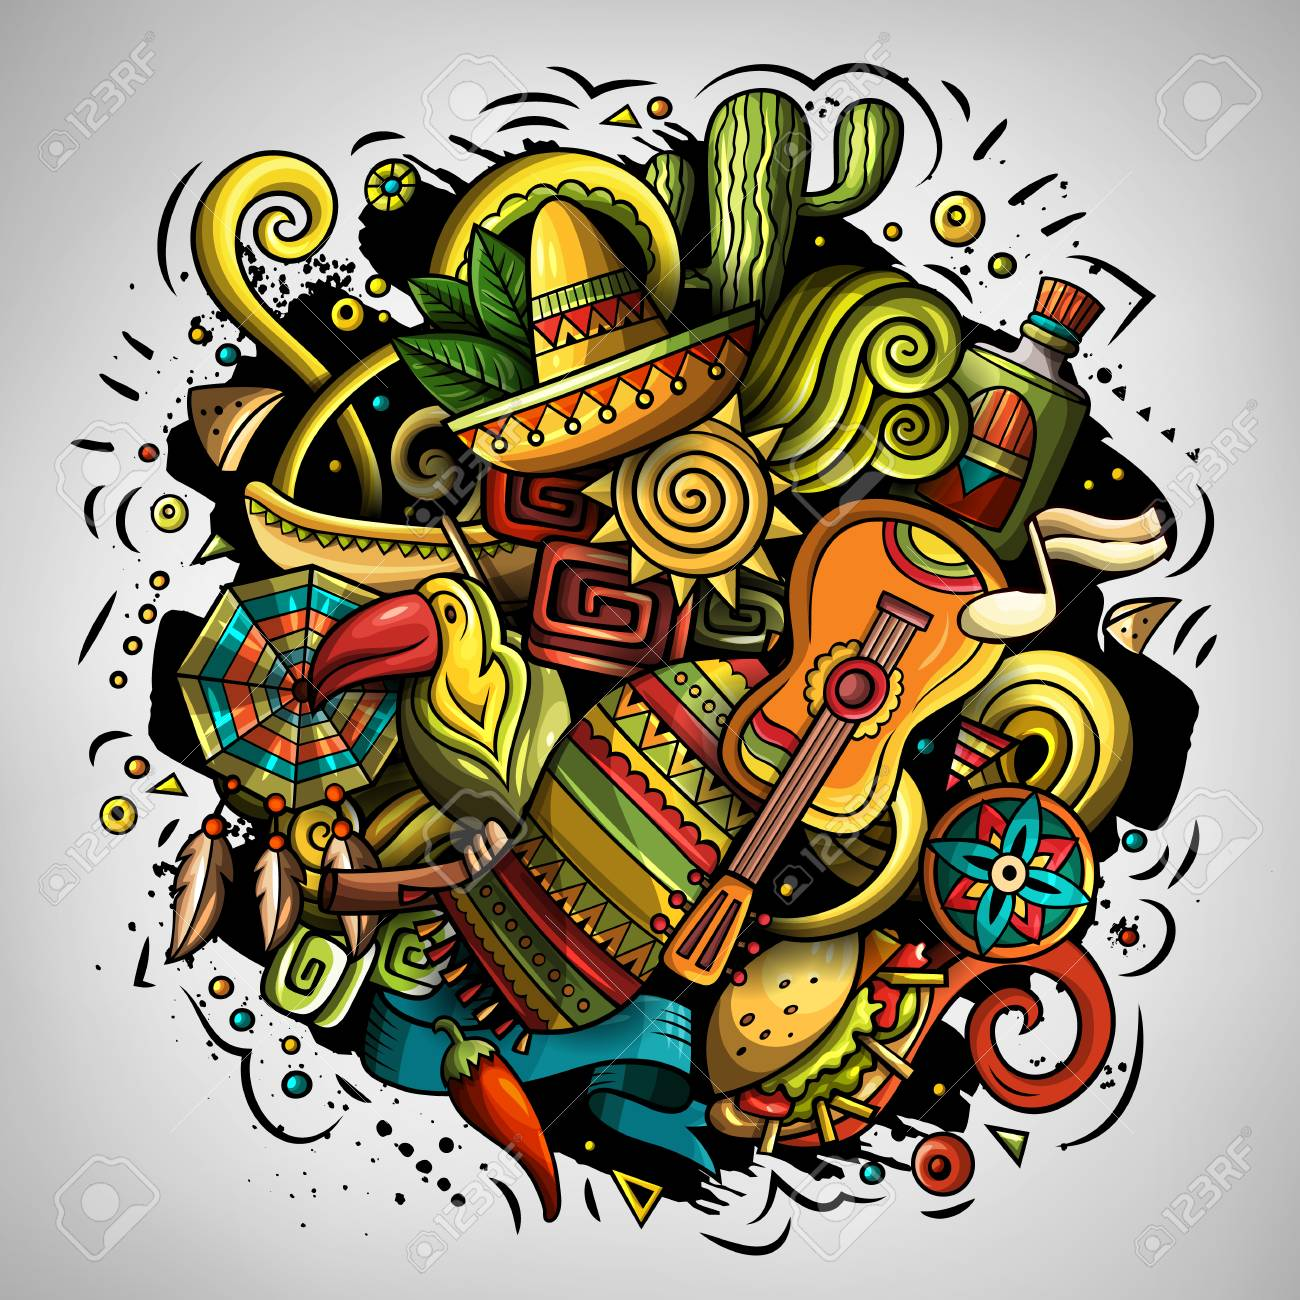 Cartoon vector doodles with Latin American theme illustration - 97580753